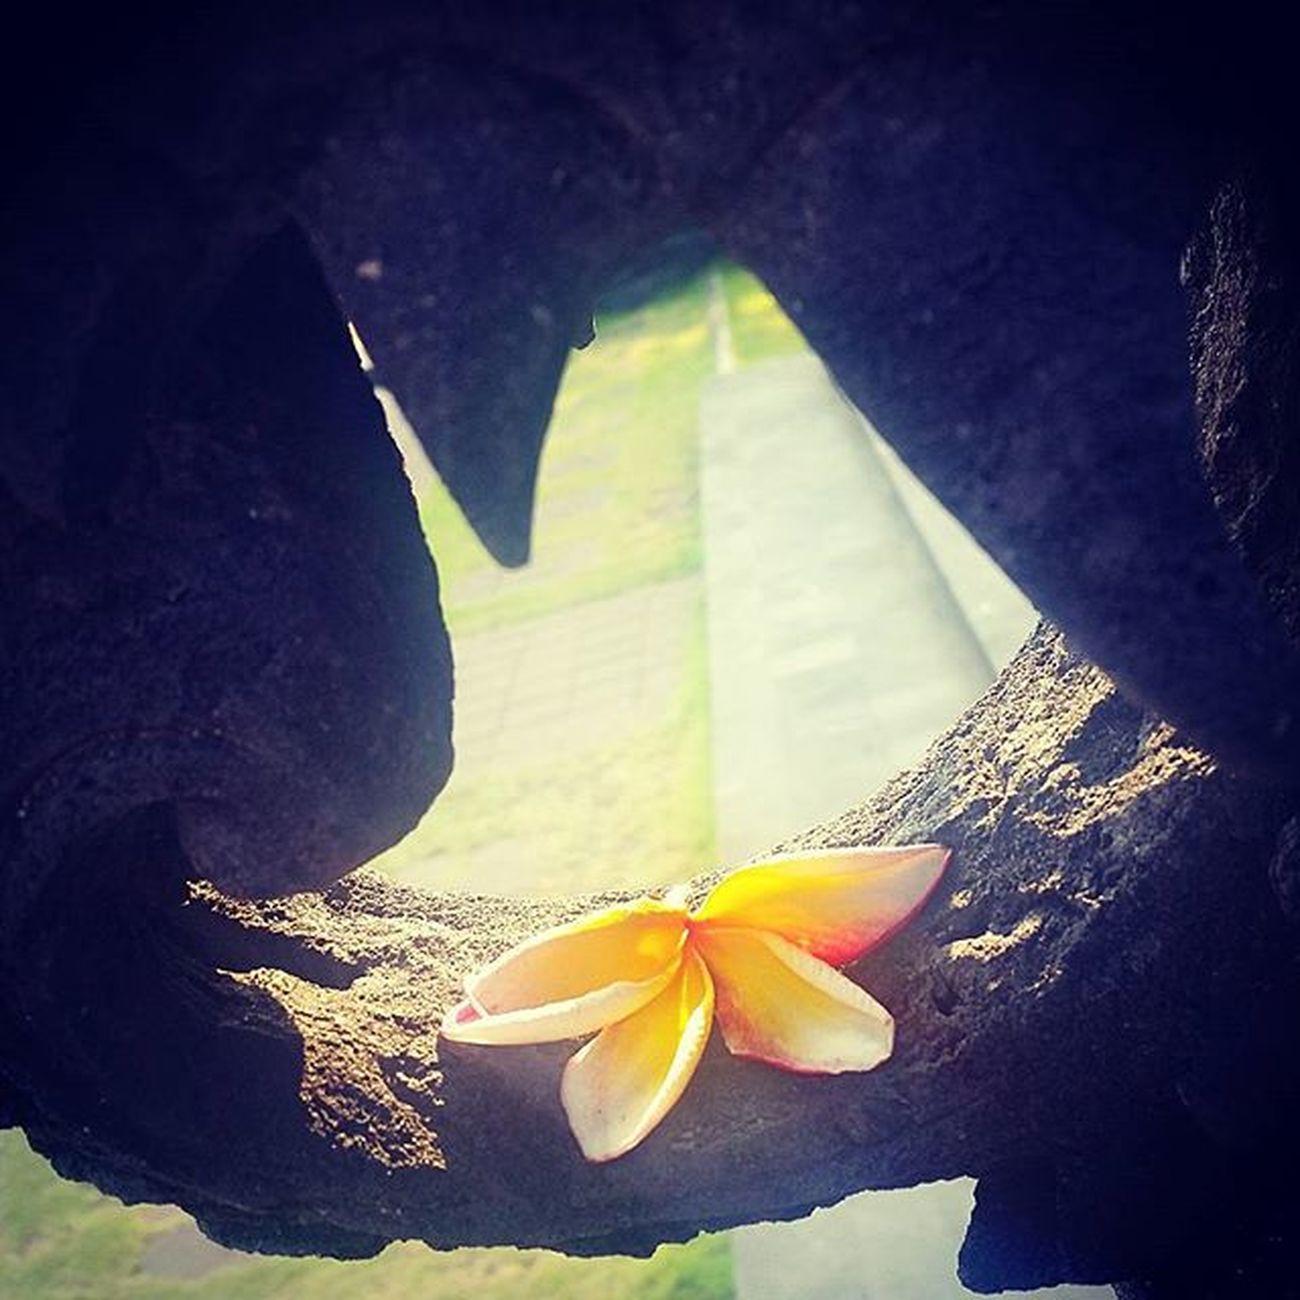 Ig_artistry Floweroftheday Fleuroftheday Flor Ig_flore IG_Flower Ig_naturelovers Naturelovers Natur Nature_perfection Nature Ig_naturaleza